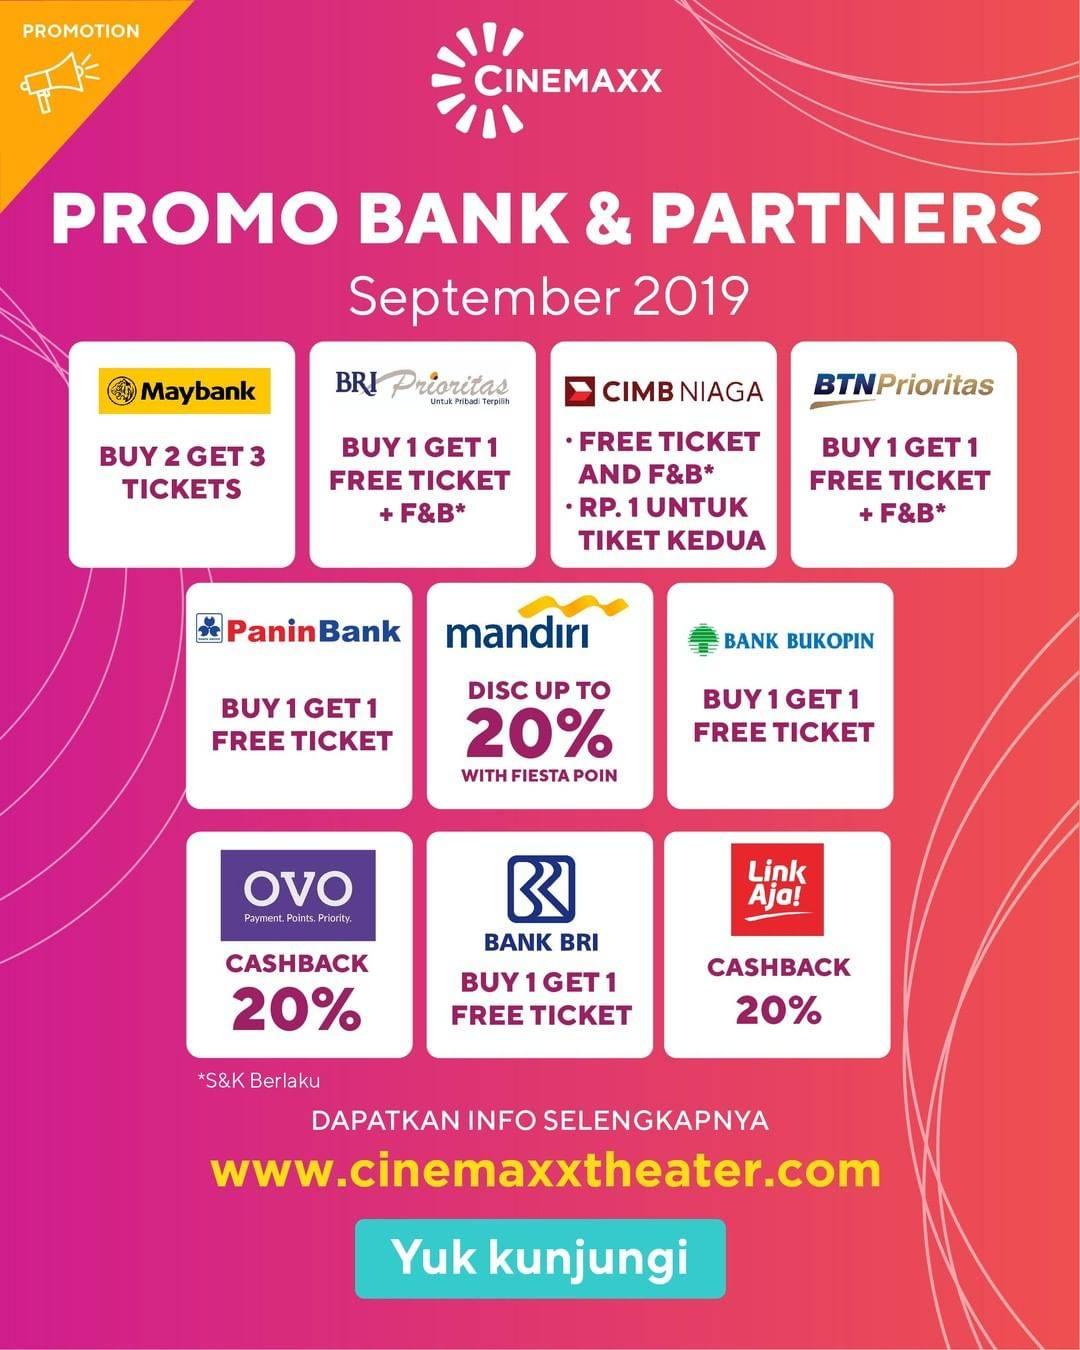 CINEMAXX Promo Beli Tiket Pakai OVO dapat Cashback 20%